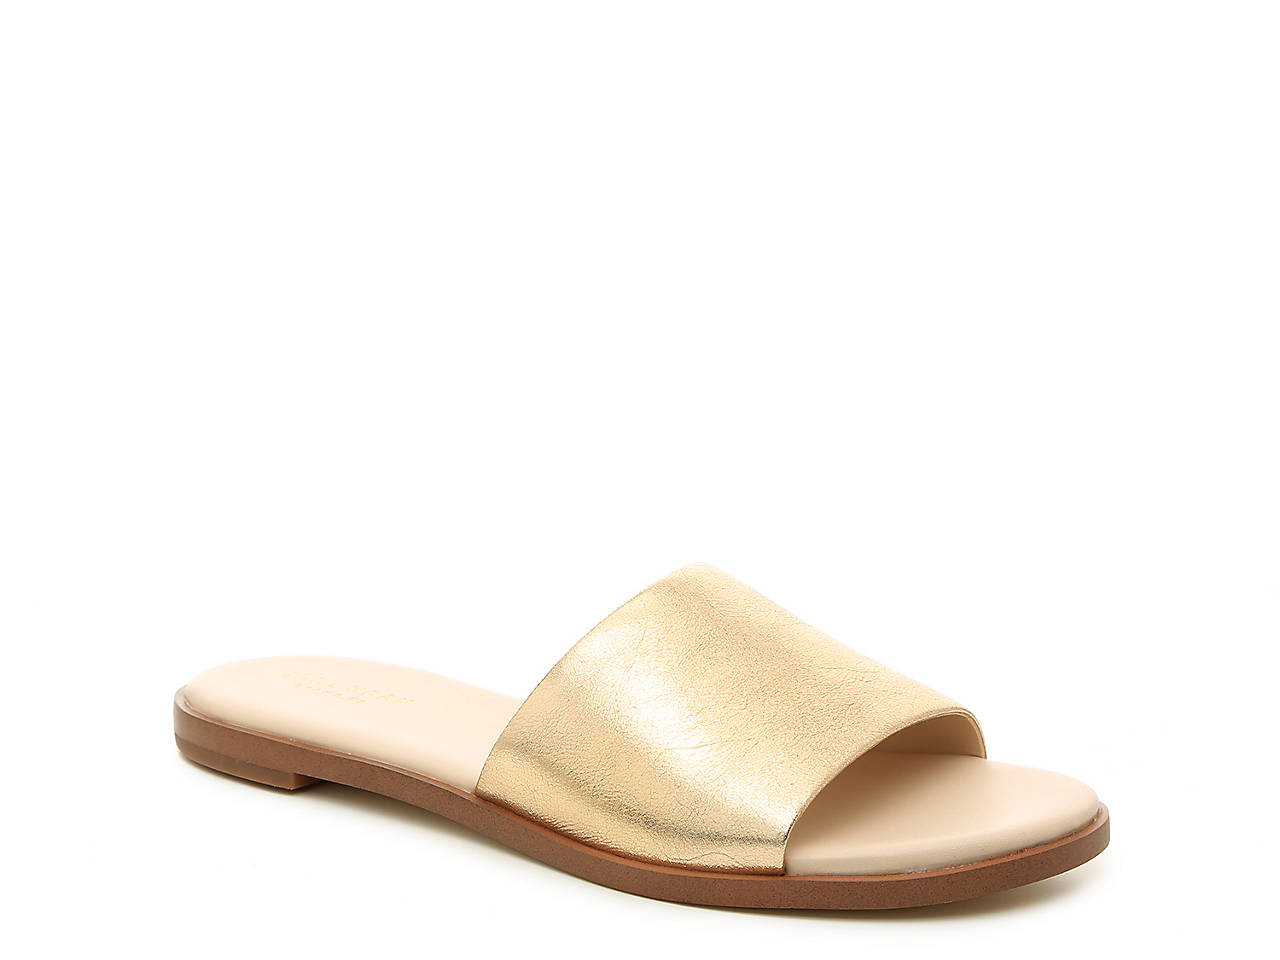 467ab6f1e355 Cole Haan Anica Slide Sandal Women s Shoes